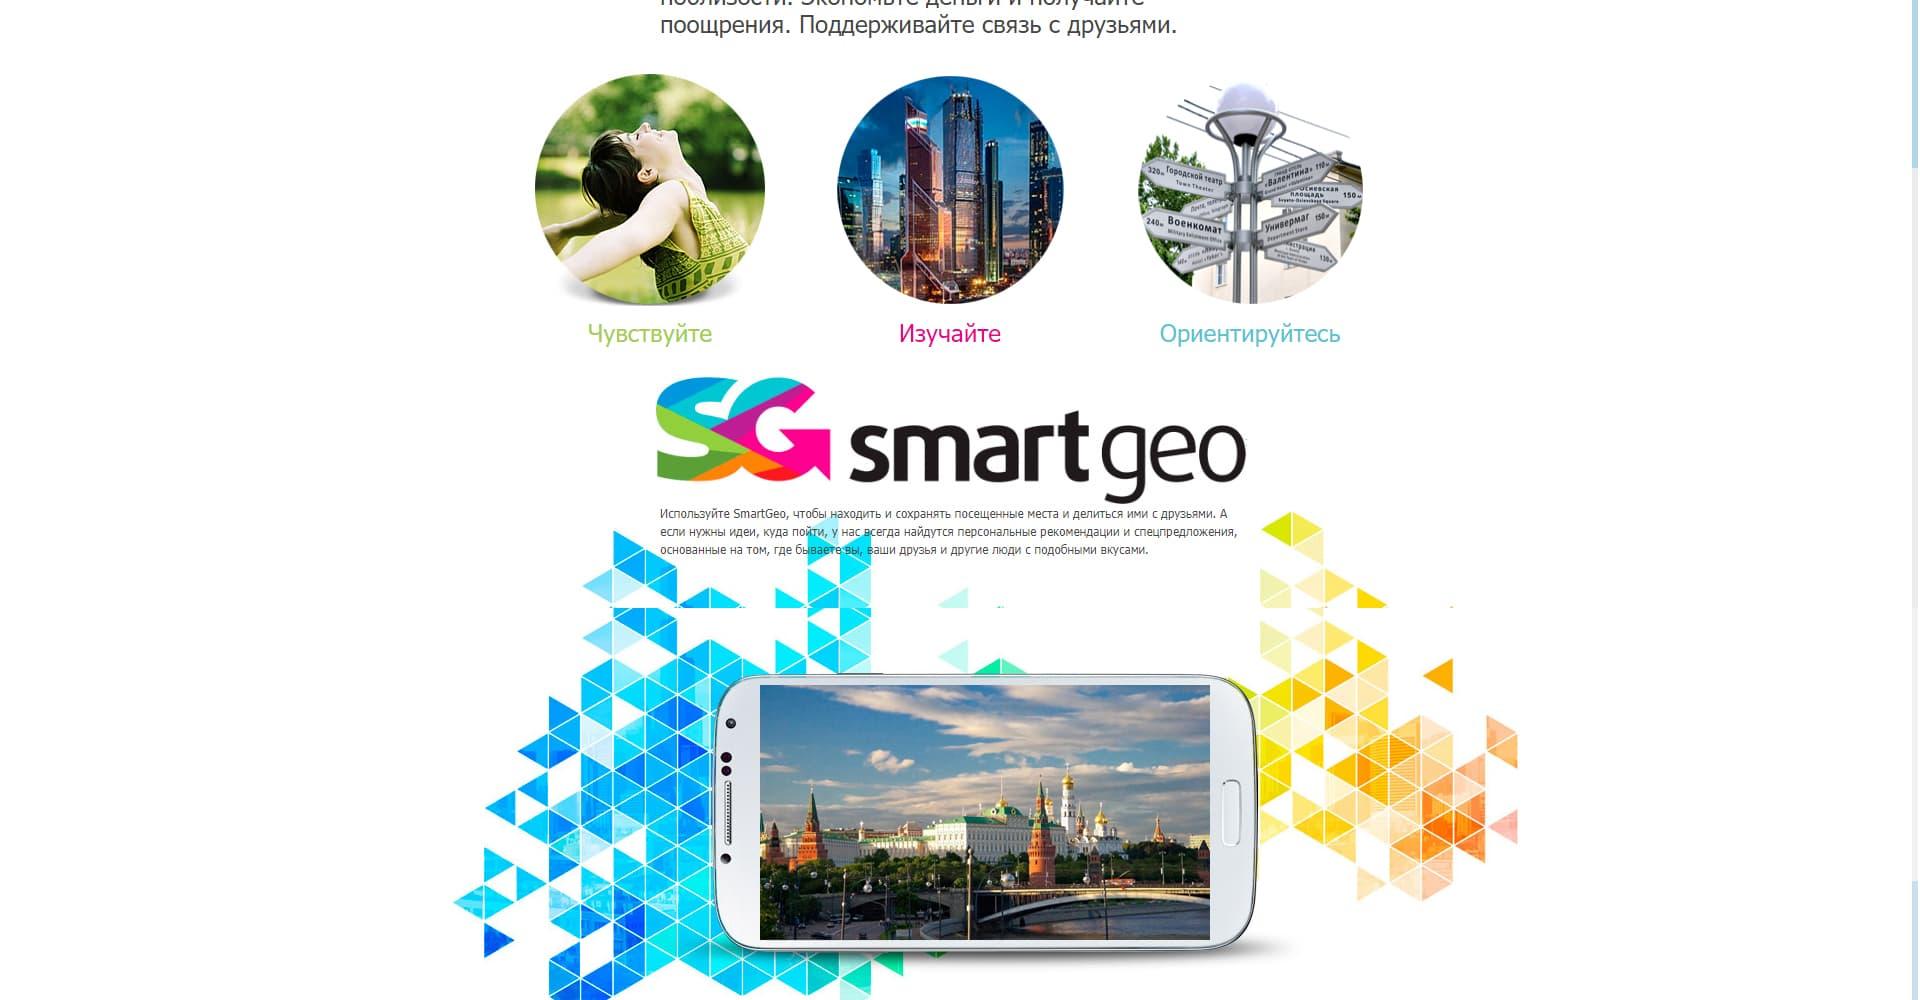 Smartgeo